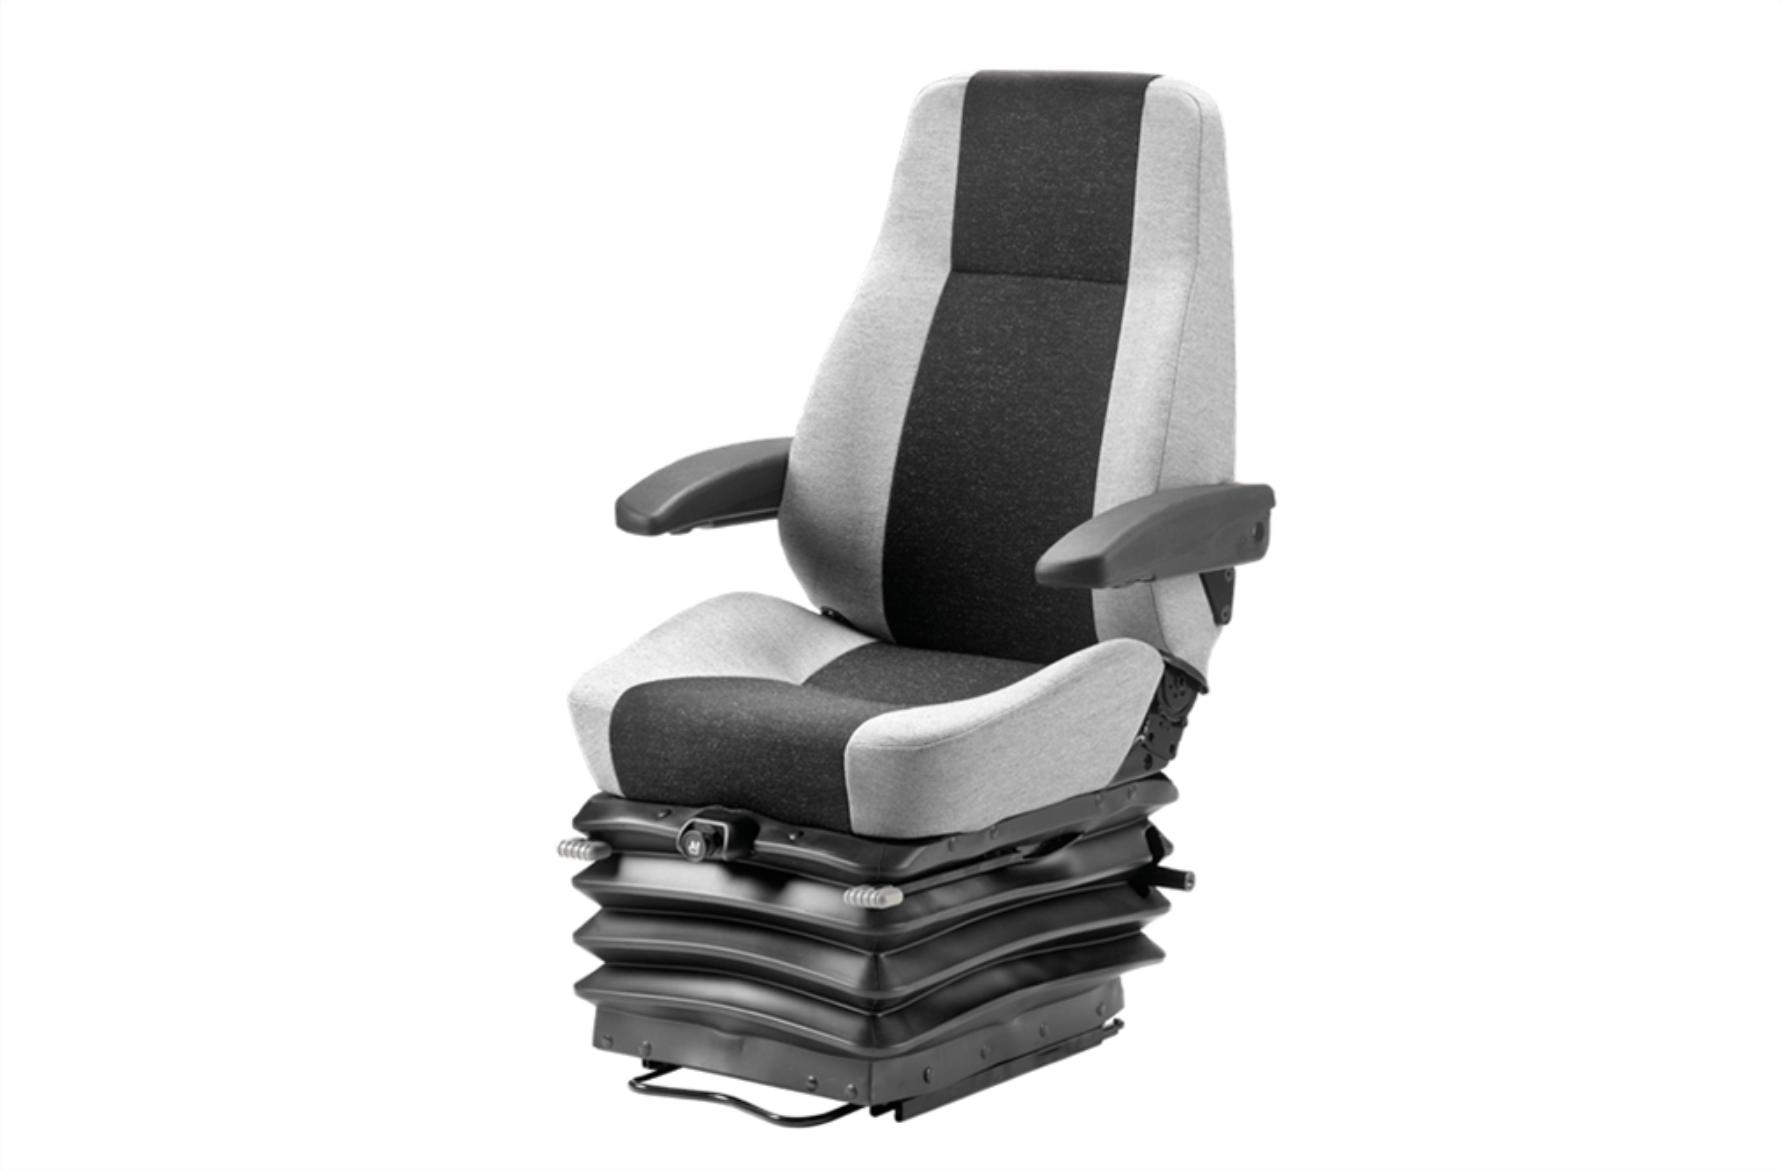 Groovy Dump Truck Artic Rigid Air 554 Ata Mining Supplies Andrewgaddart Wooden Chair Designs For Living Room Andrewgaddartcom